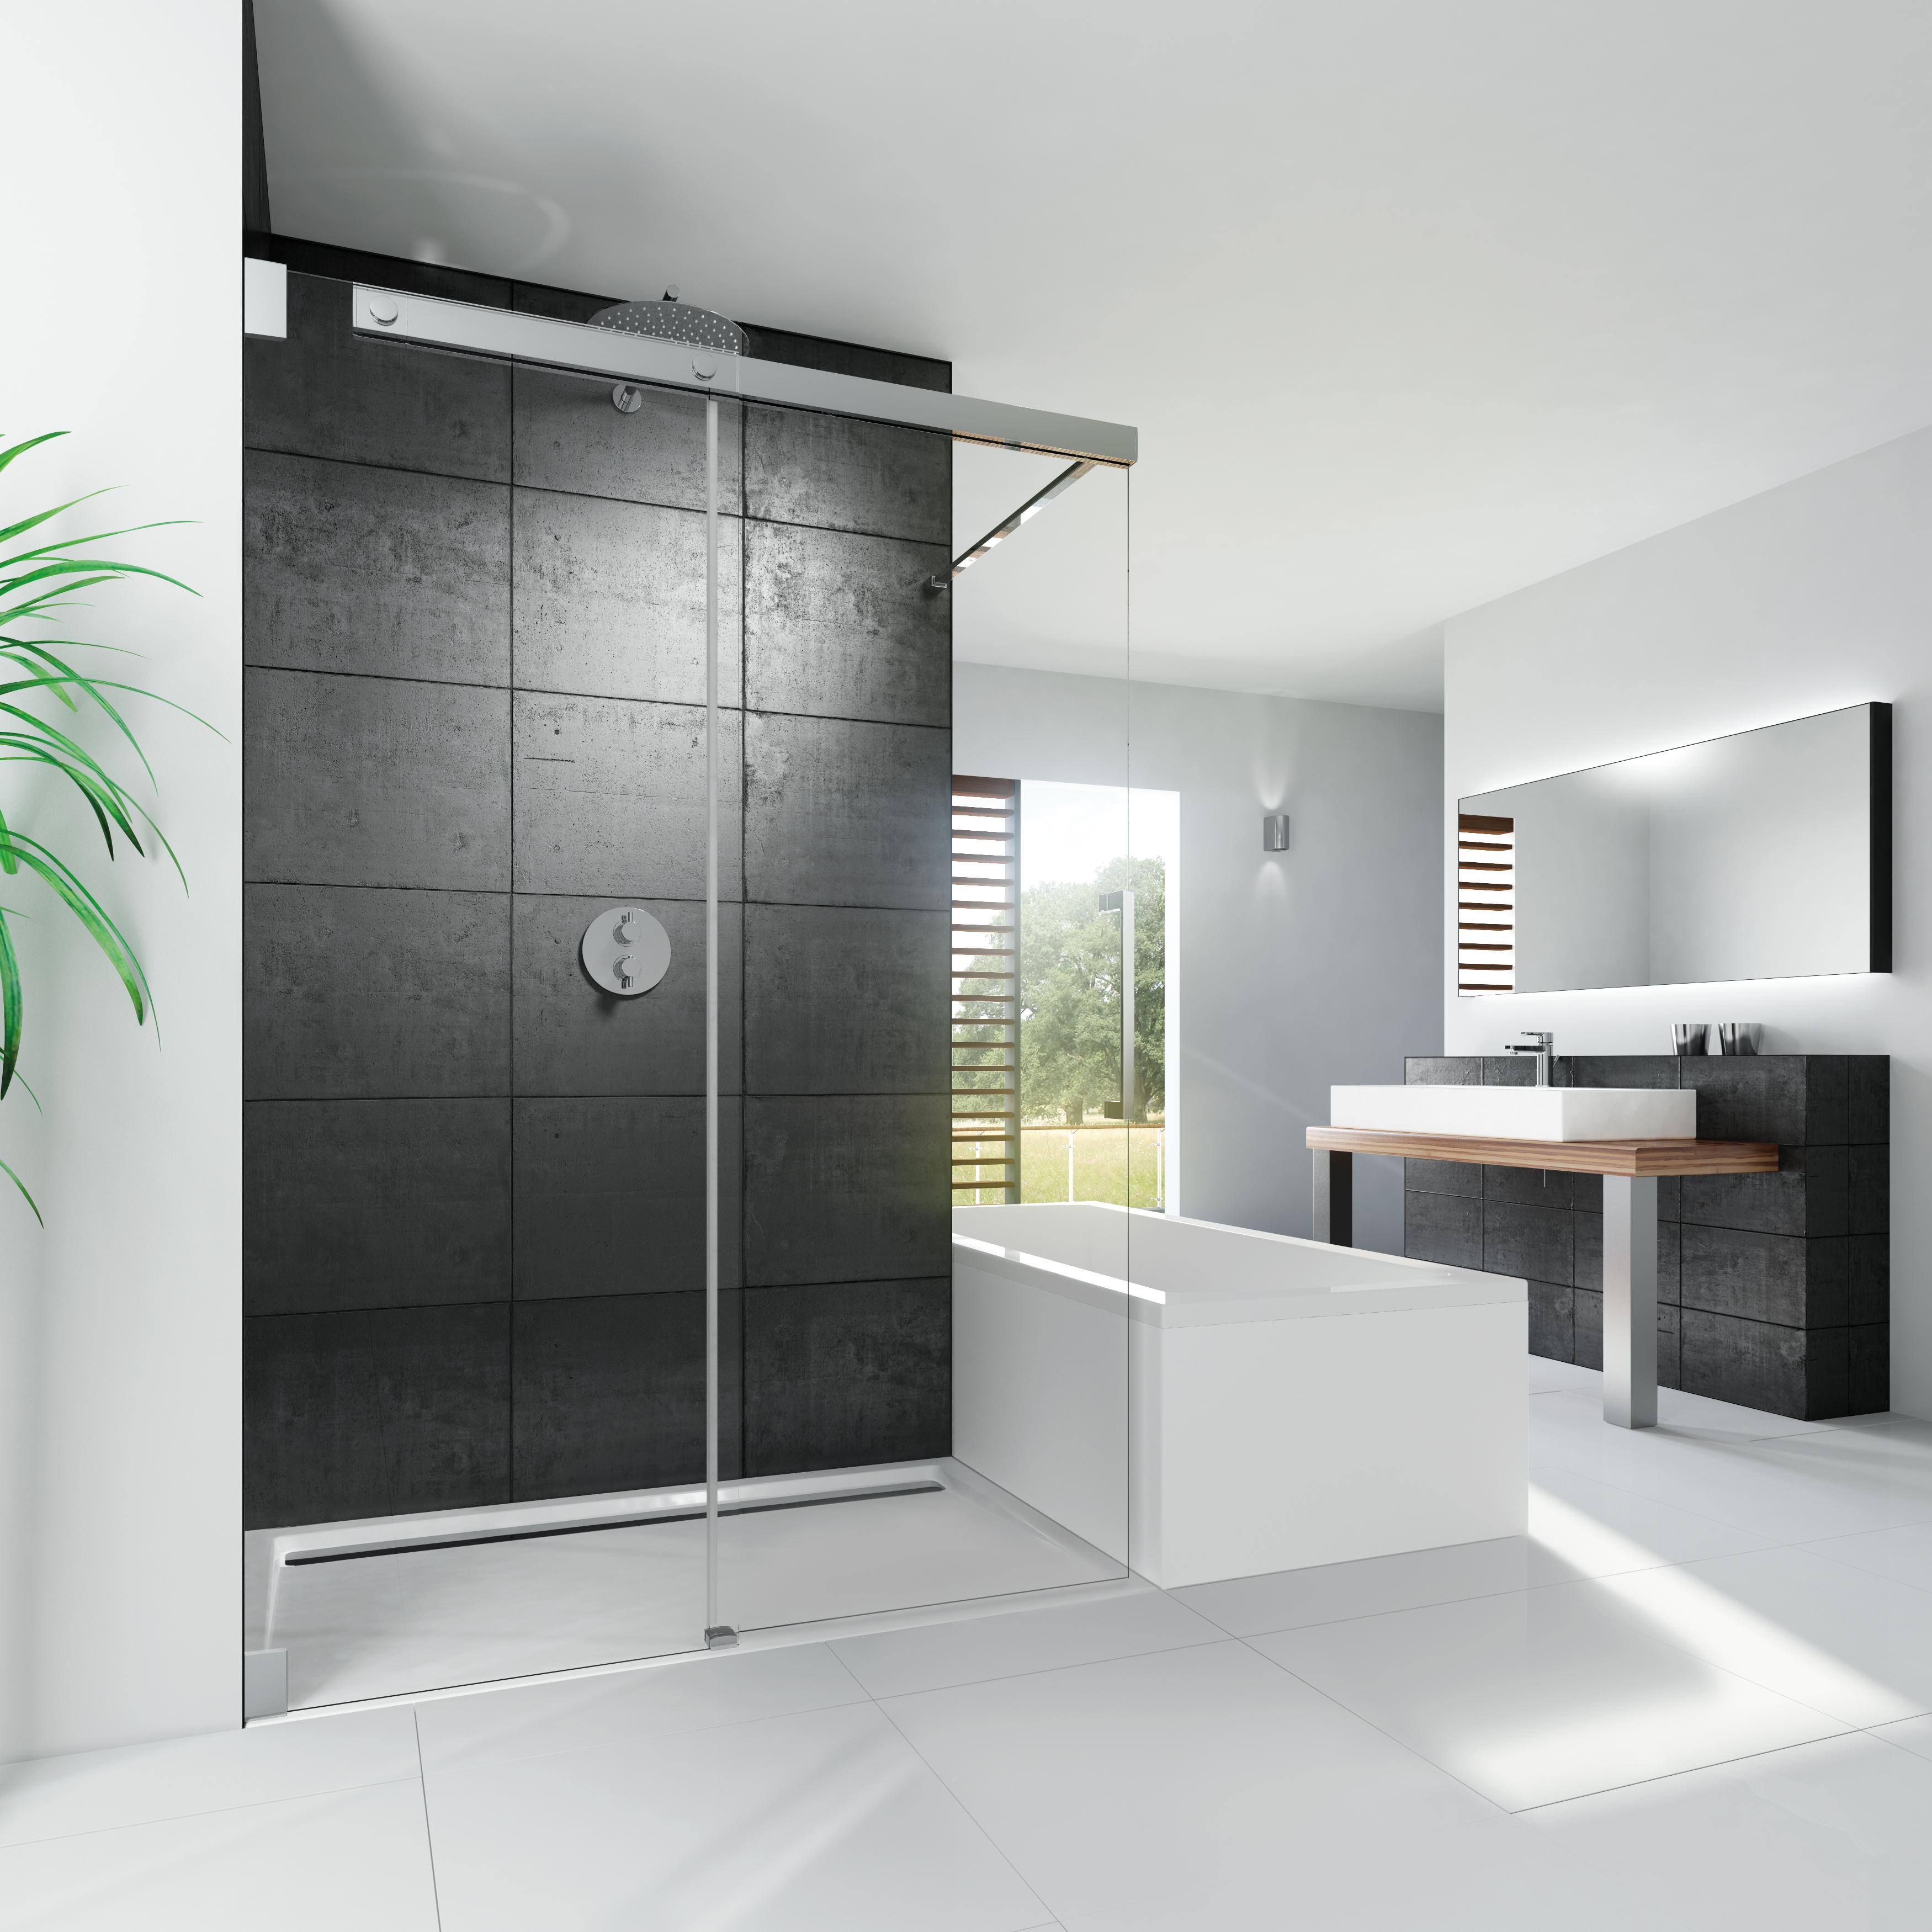 Hsk Walk In.Hsk Showers Kg K2p Walk In Sliding Door